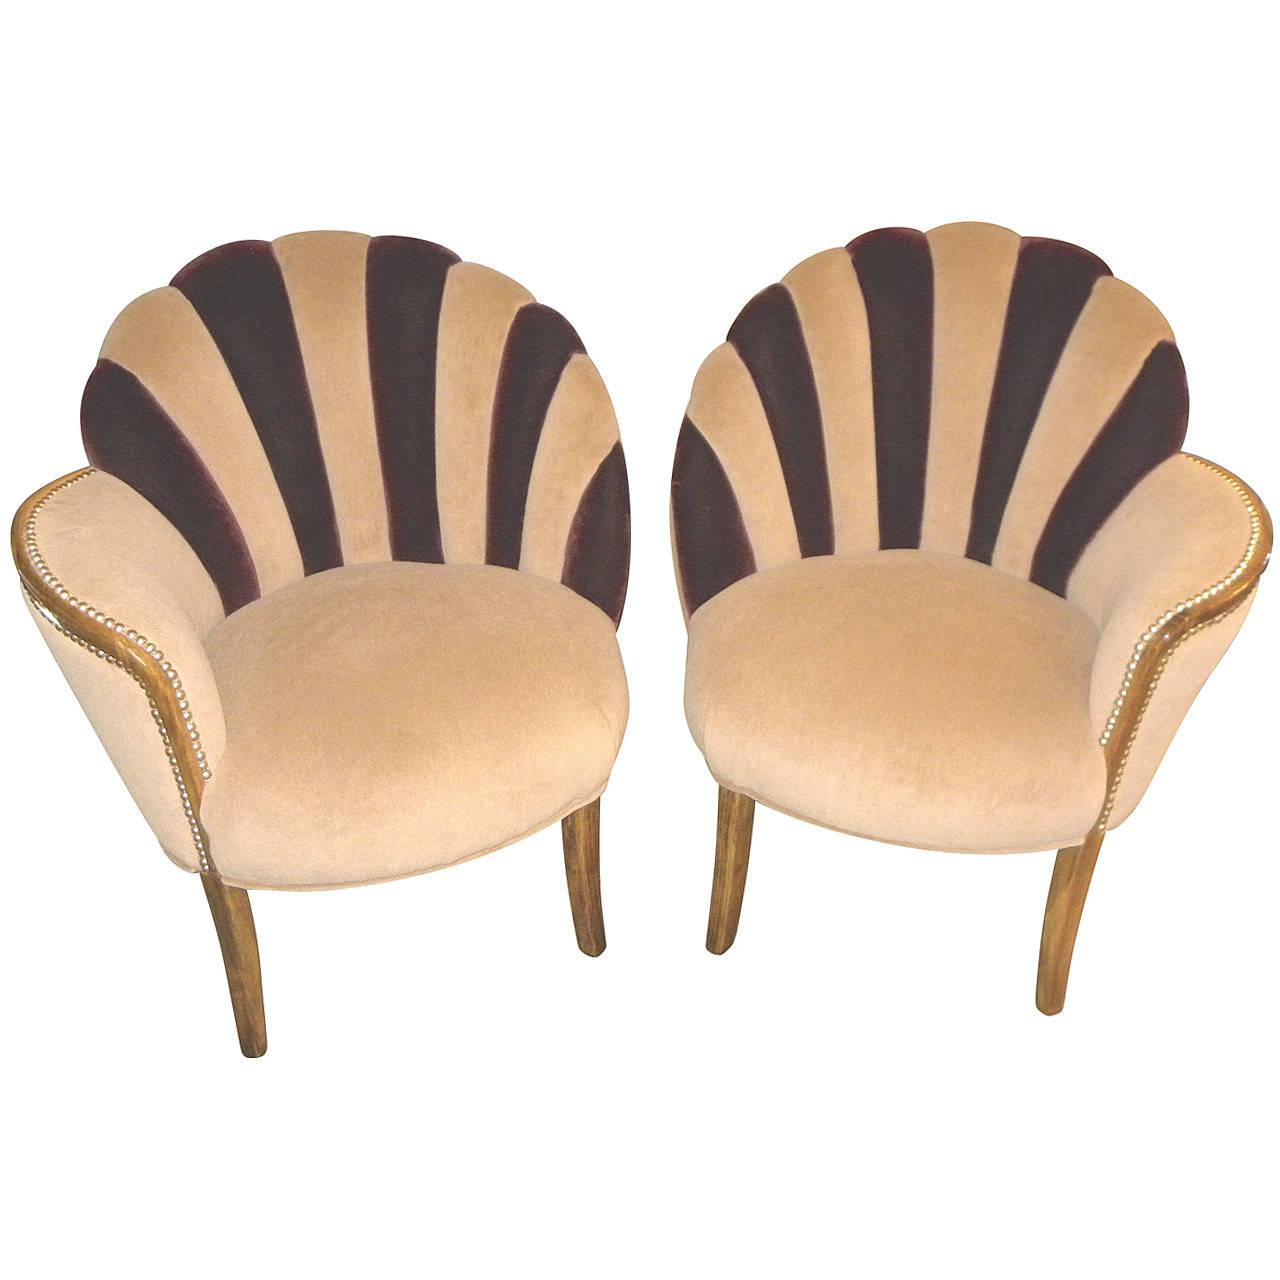 High Style Art Deco Fan Backed Side Chairs